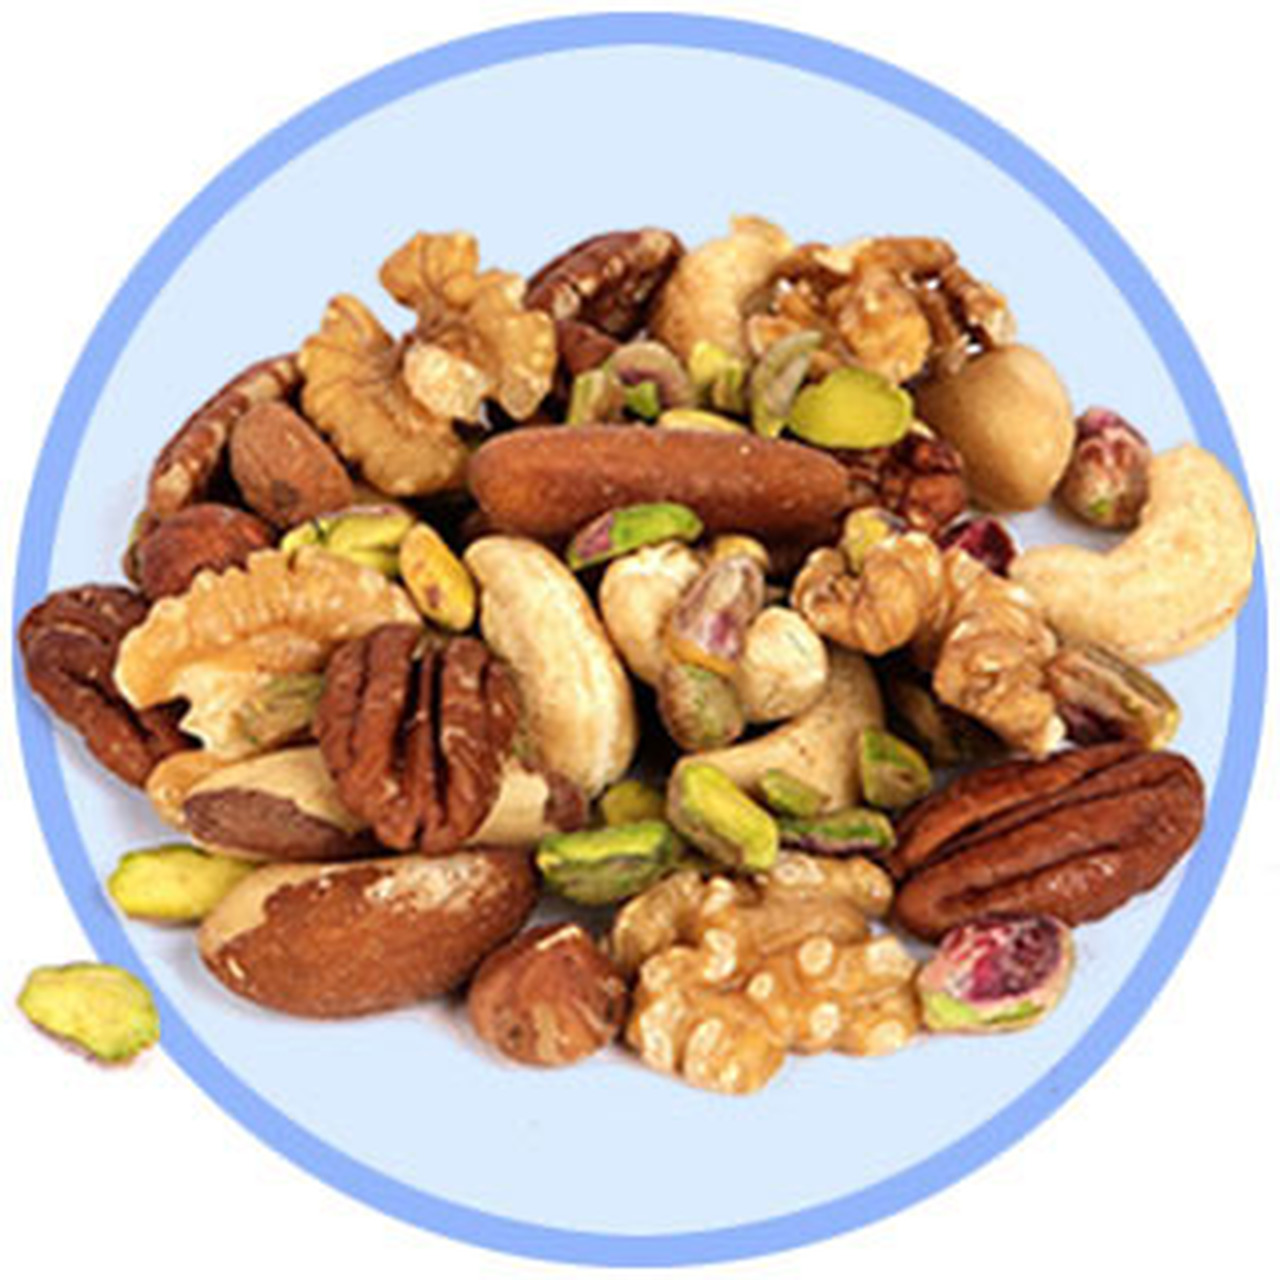 Shelled (No Shell) Nuts